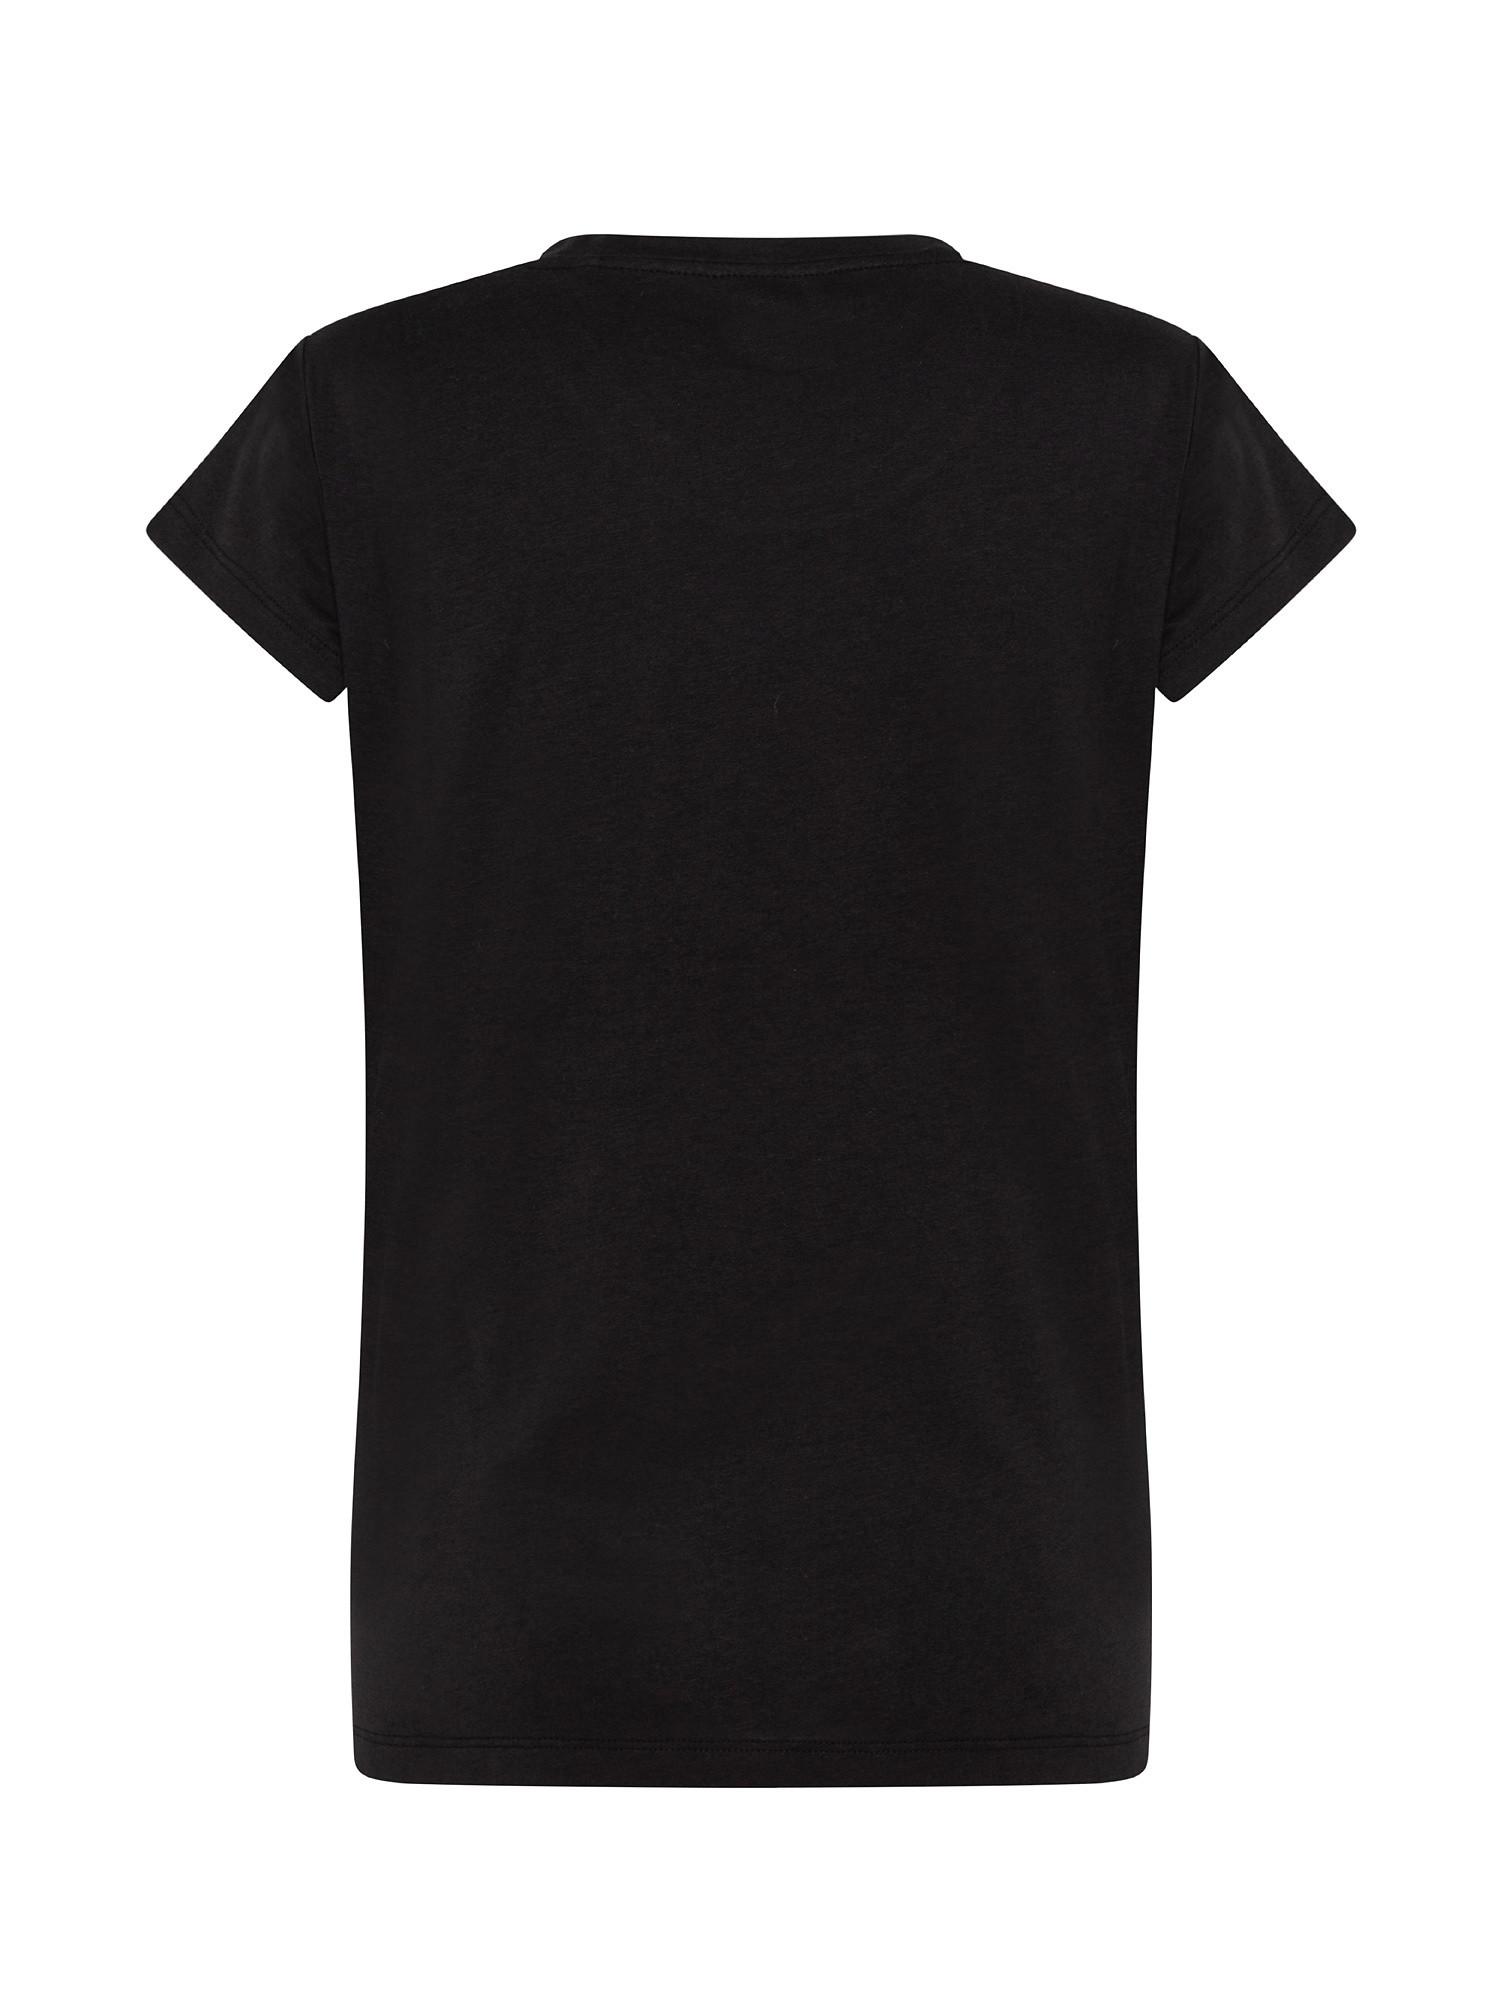 T-shirt donna Corinne, Nero, large image number 1